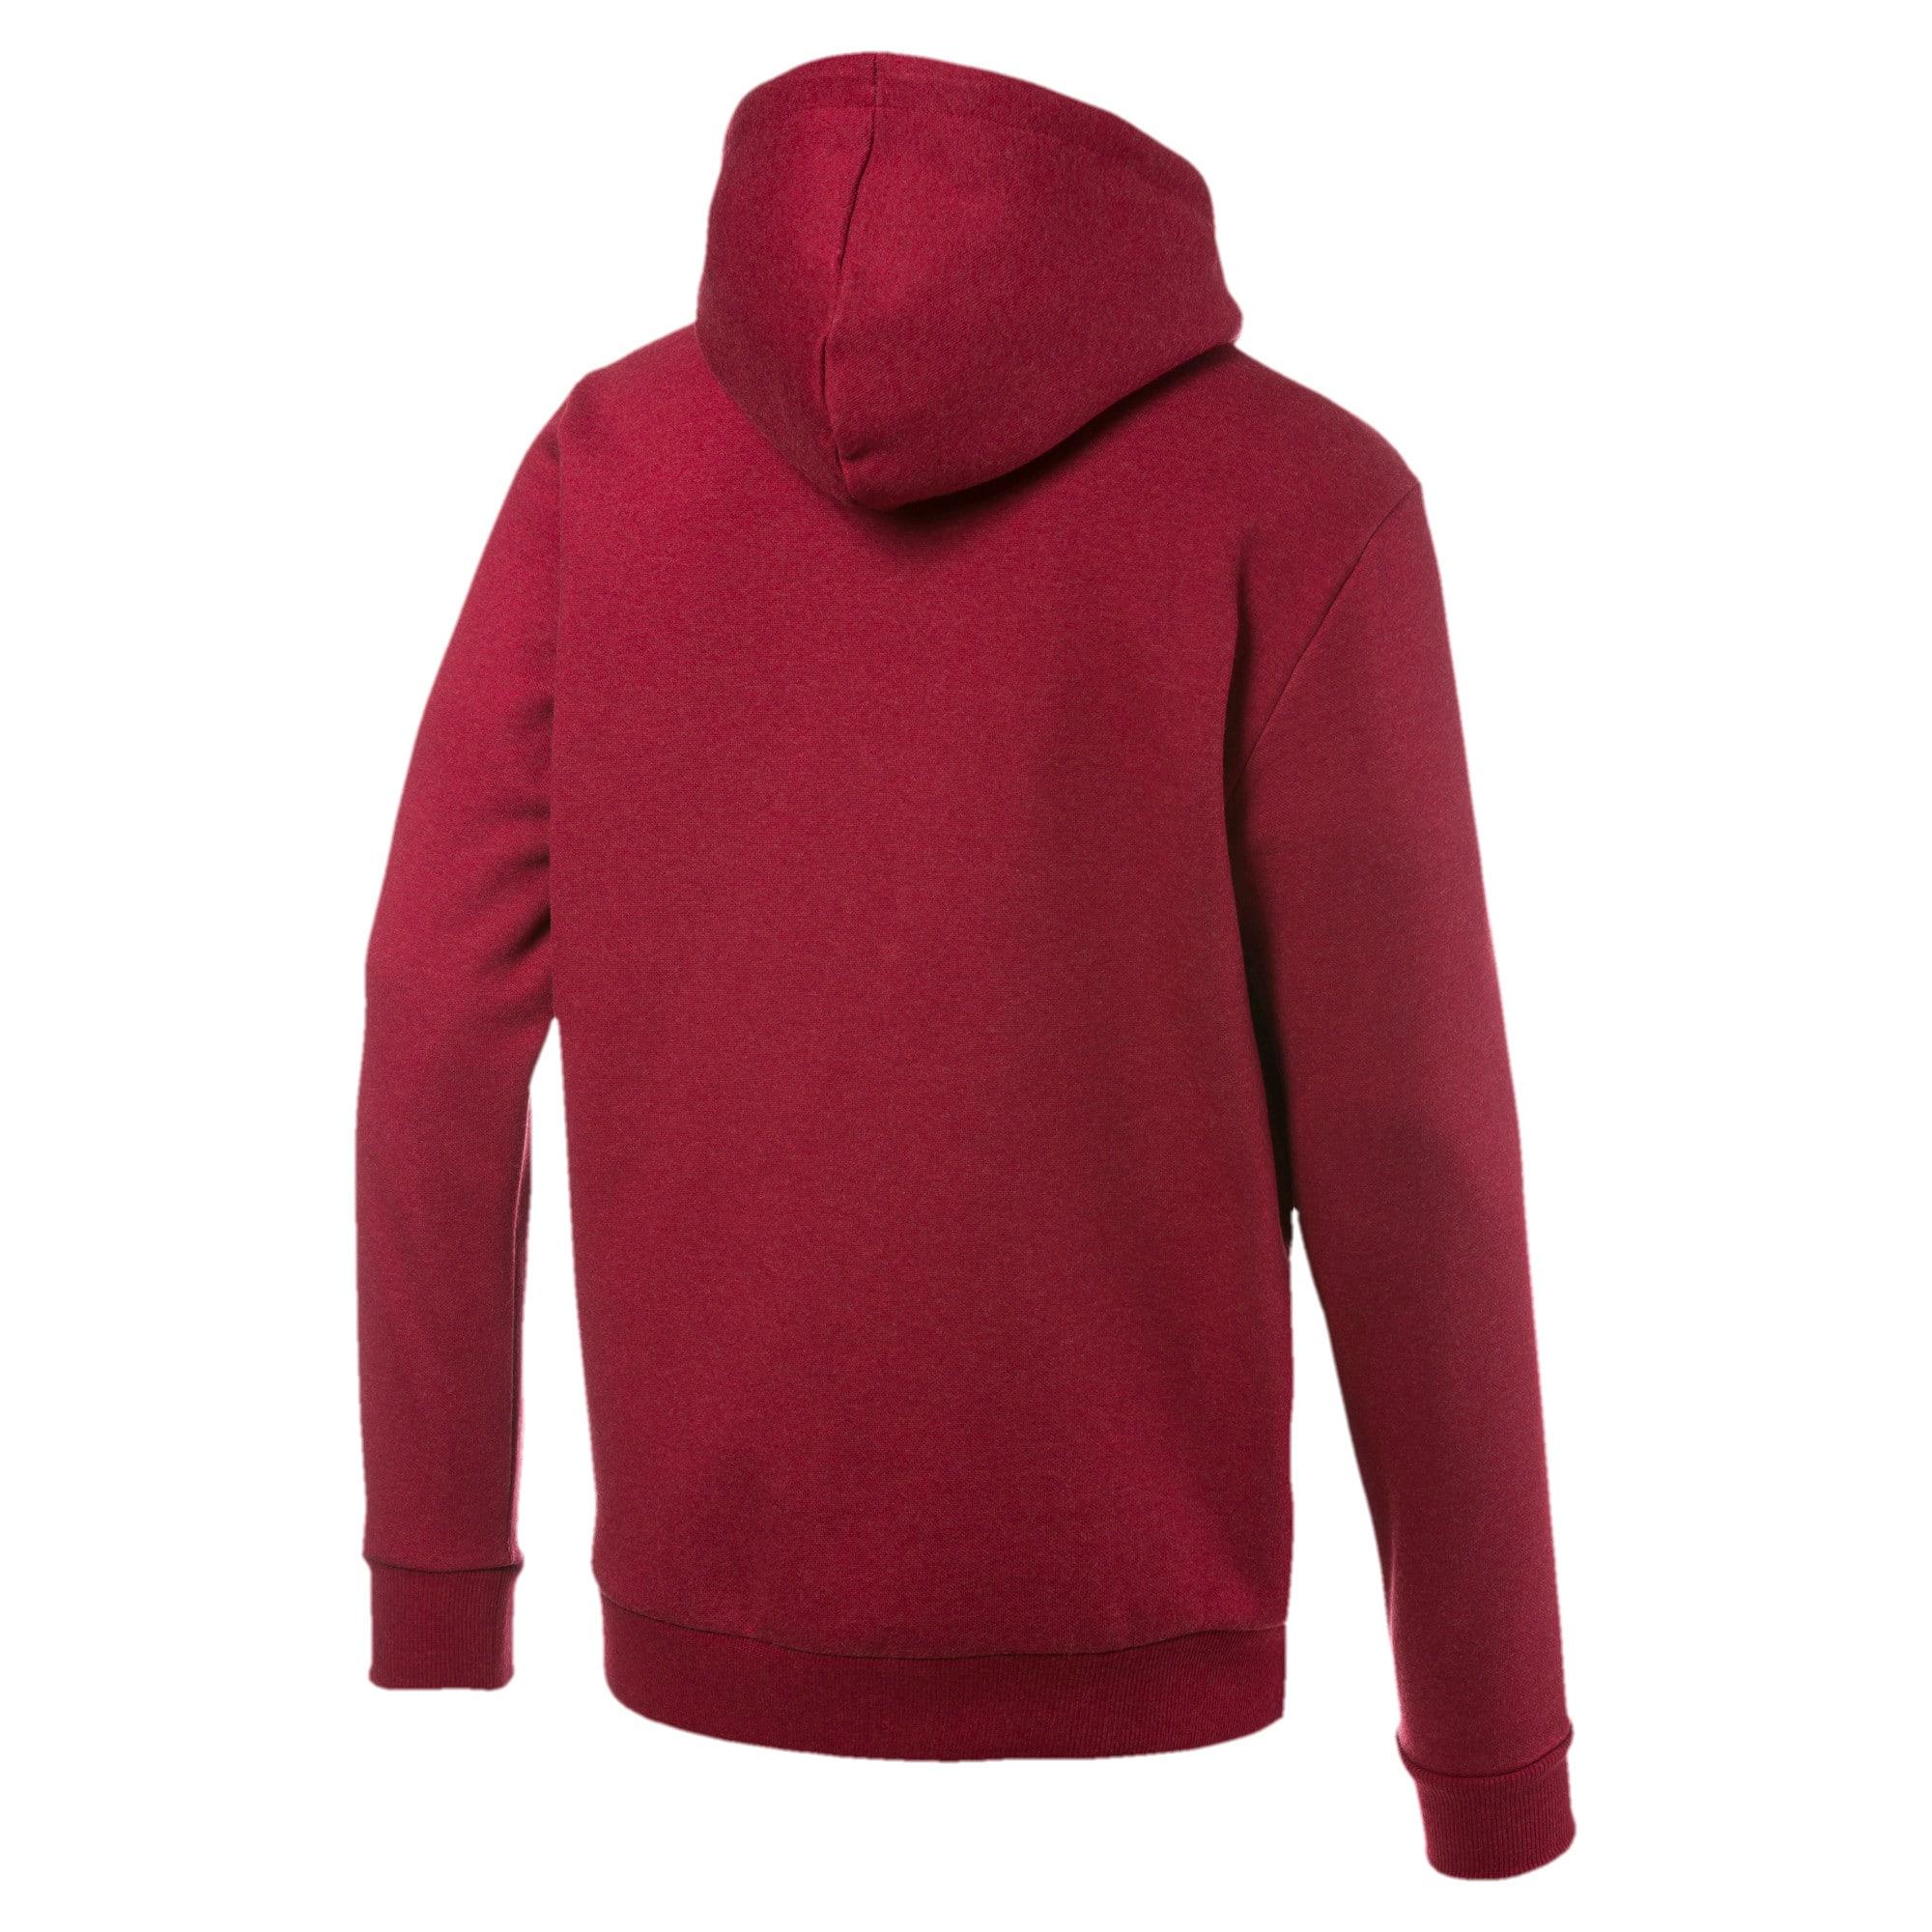 Thumbnail 5 of Essentials+ Men's Fleece Hoodie, Rhubarb Heather, medium